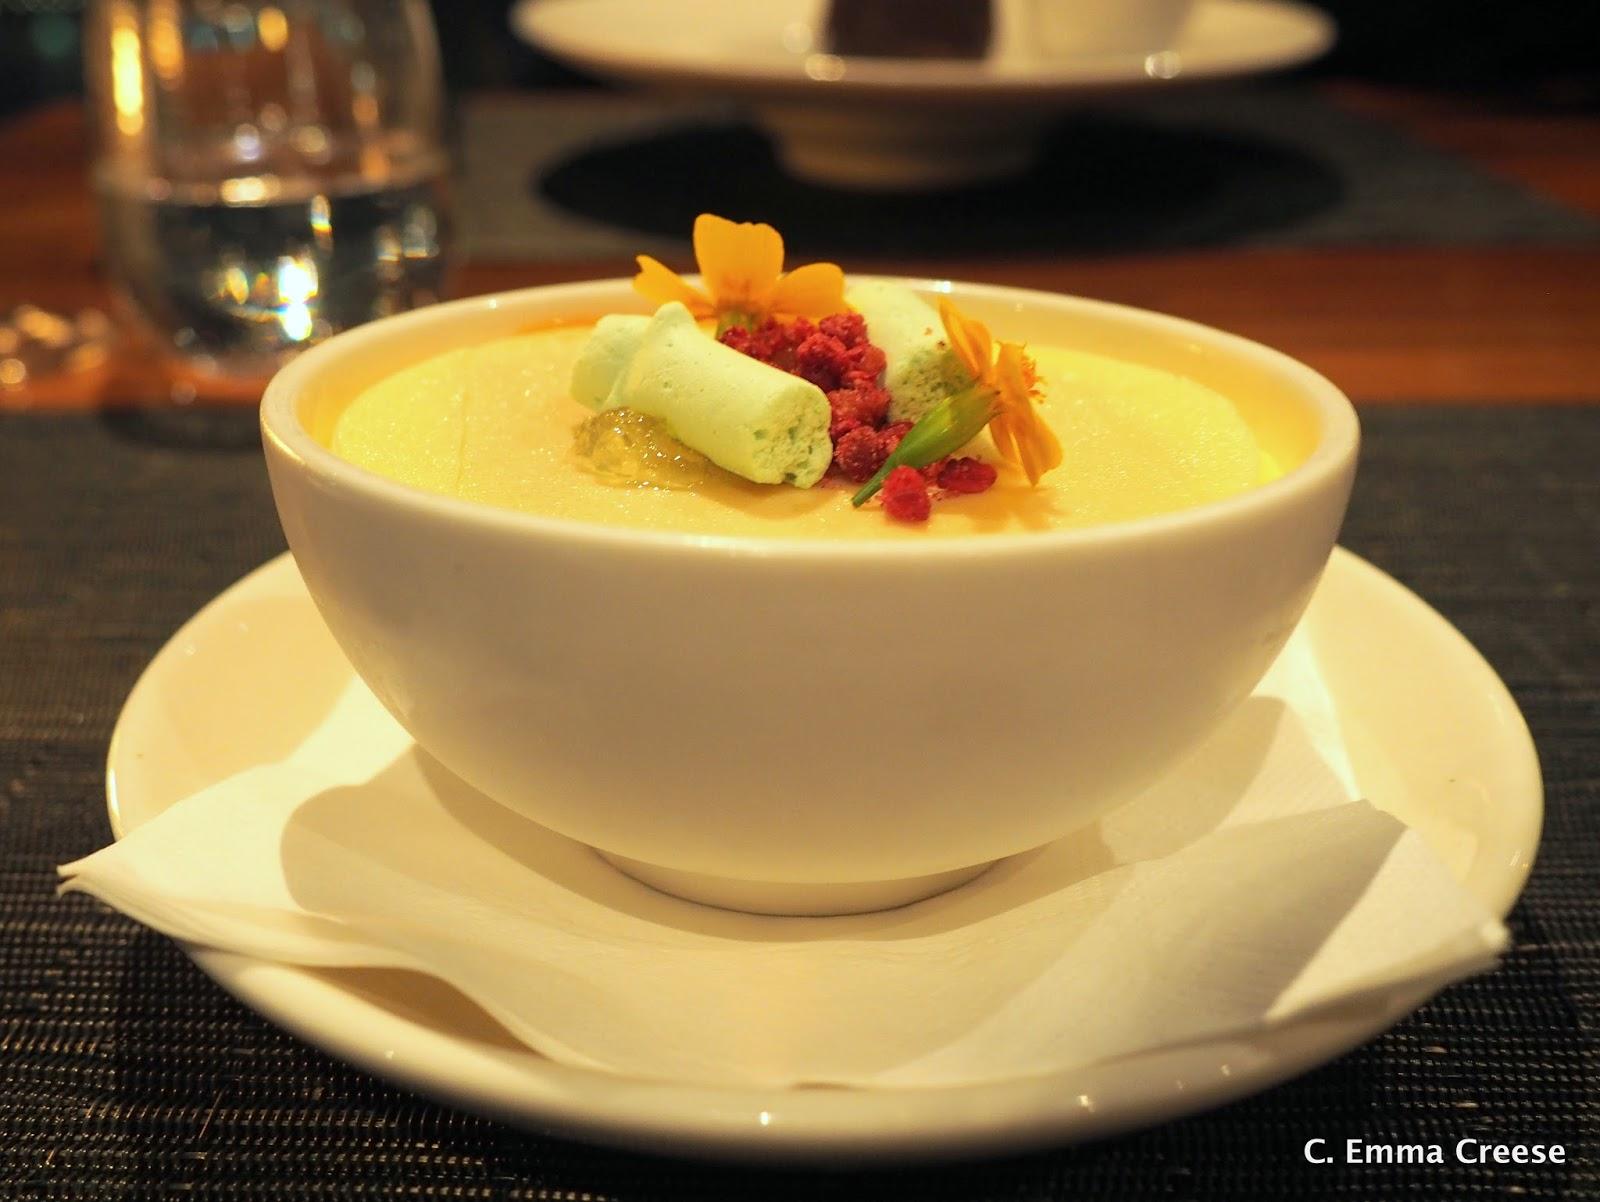 Orbit 360° Dining - Restaurant Review - SKYCITY Auckland, New Zealand Adventures of a London Kiwi